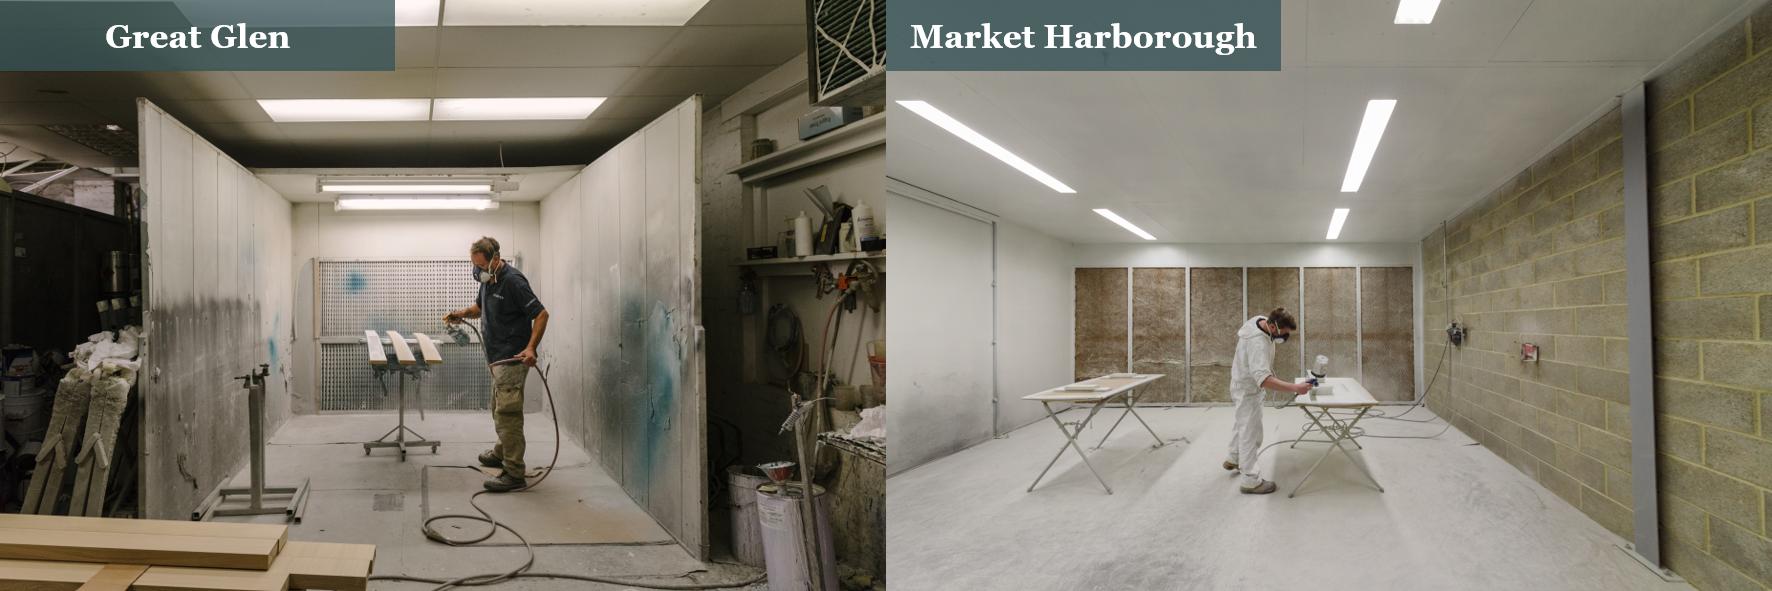 Thorpes Joinery Spray Shop - Market Harborough vs Great Glen